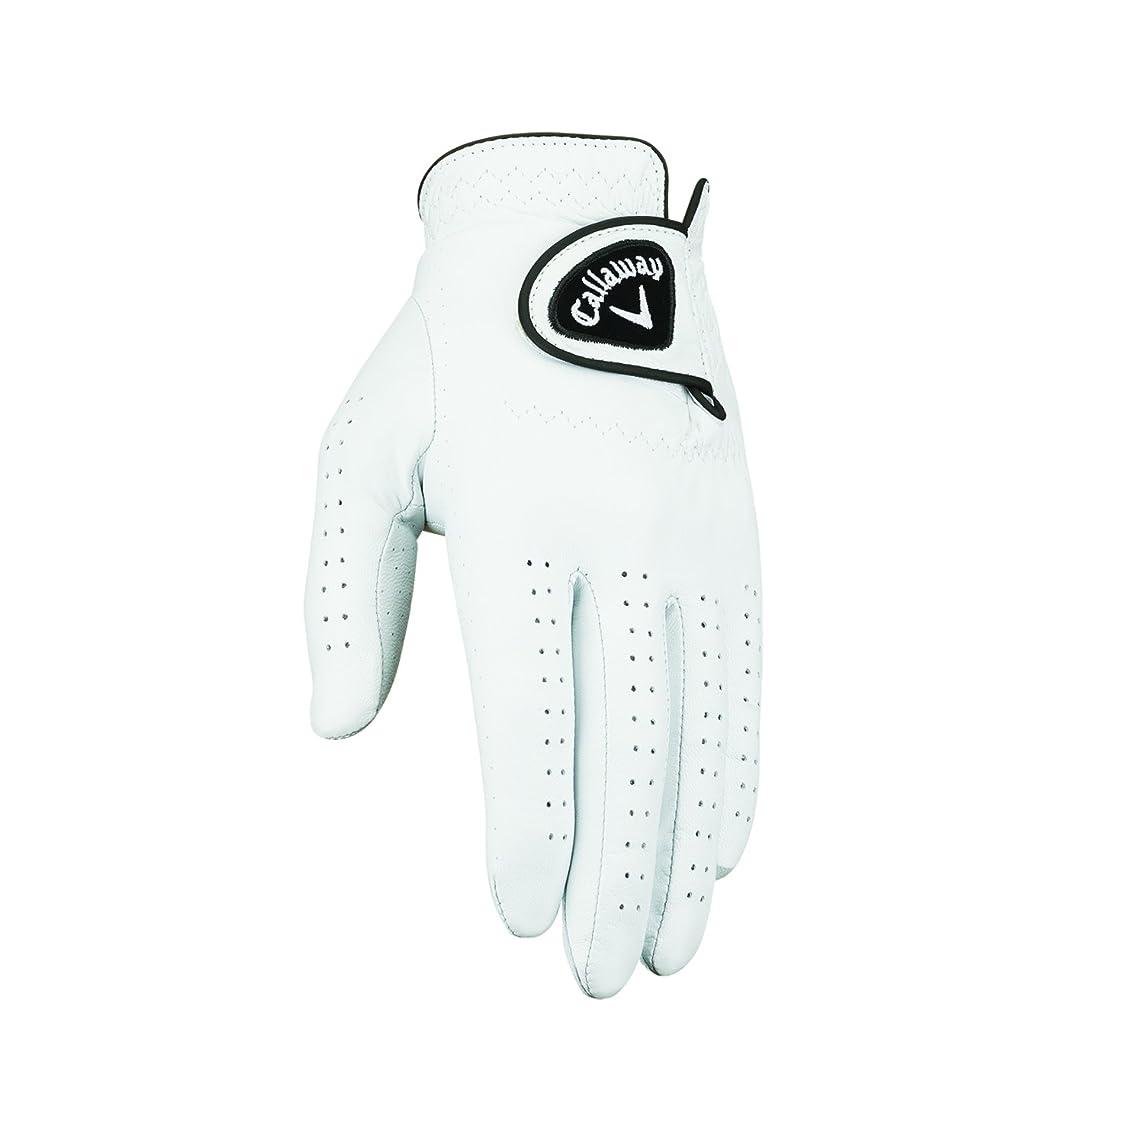 Callaway Men's Dawn Patrol Golf Glove (Leather), Prior Generation